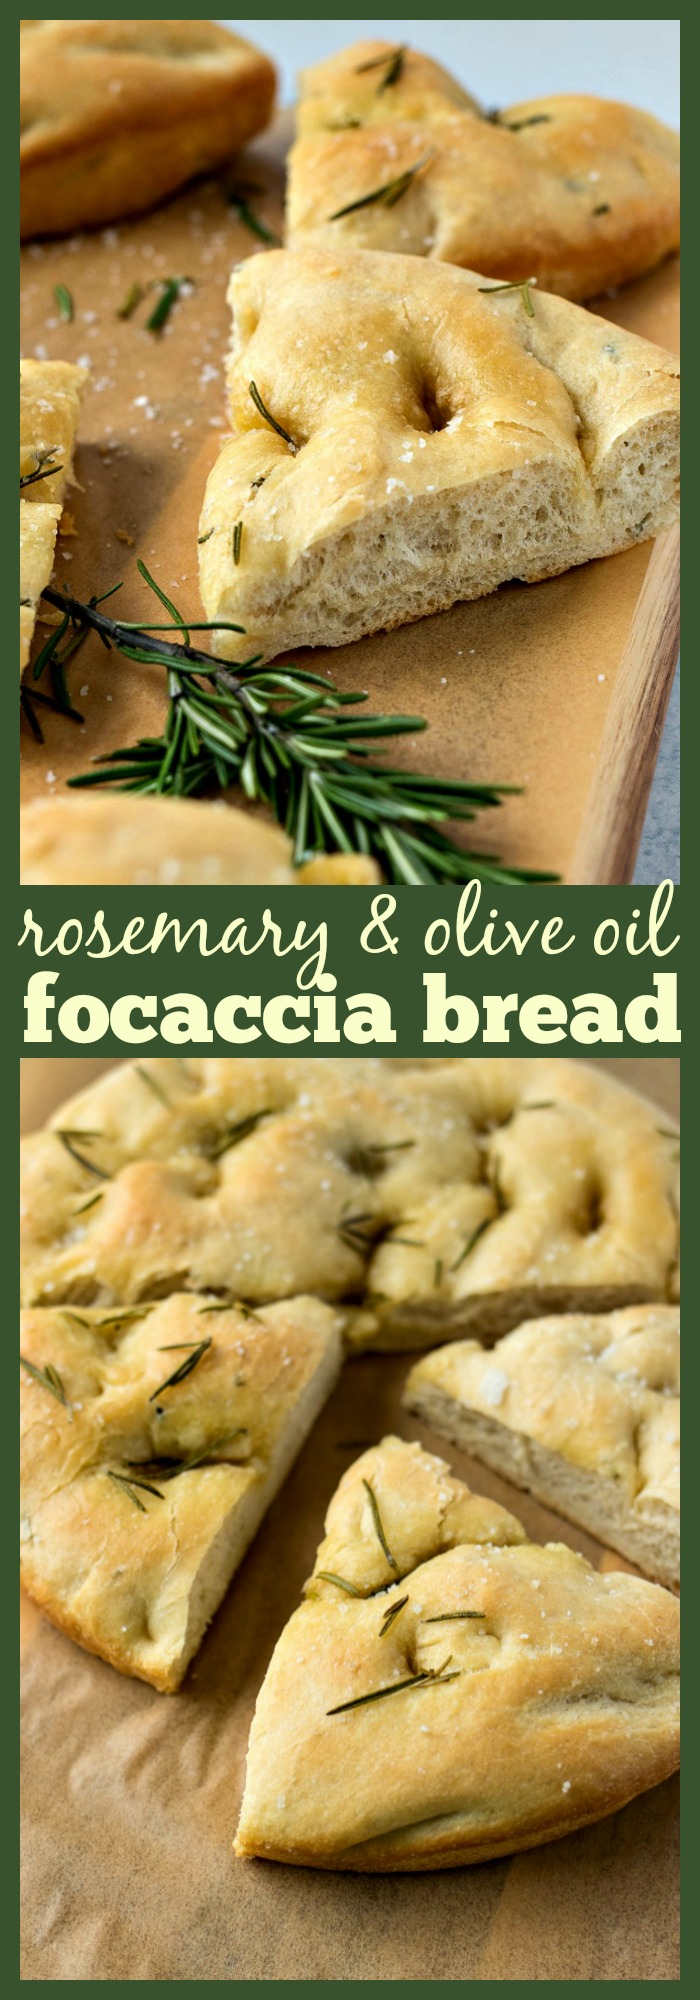 Rosemary & Olive Oil Focaccia Bread photo collage